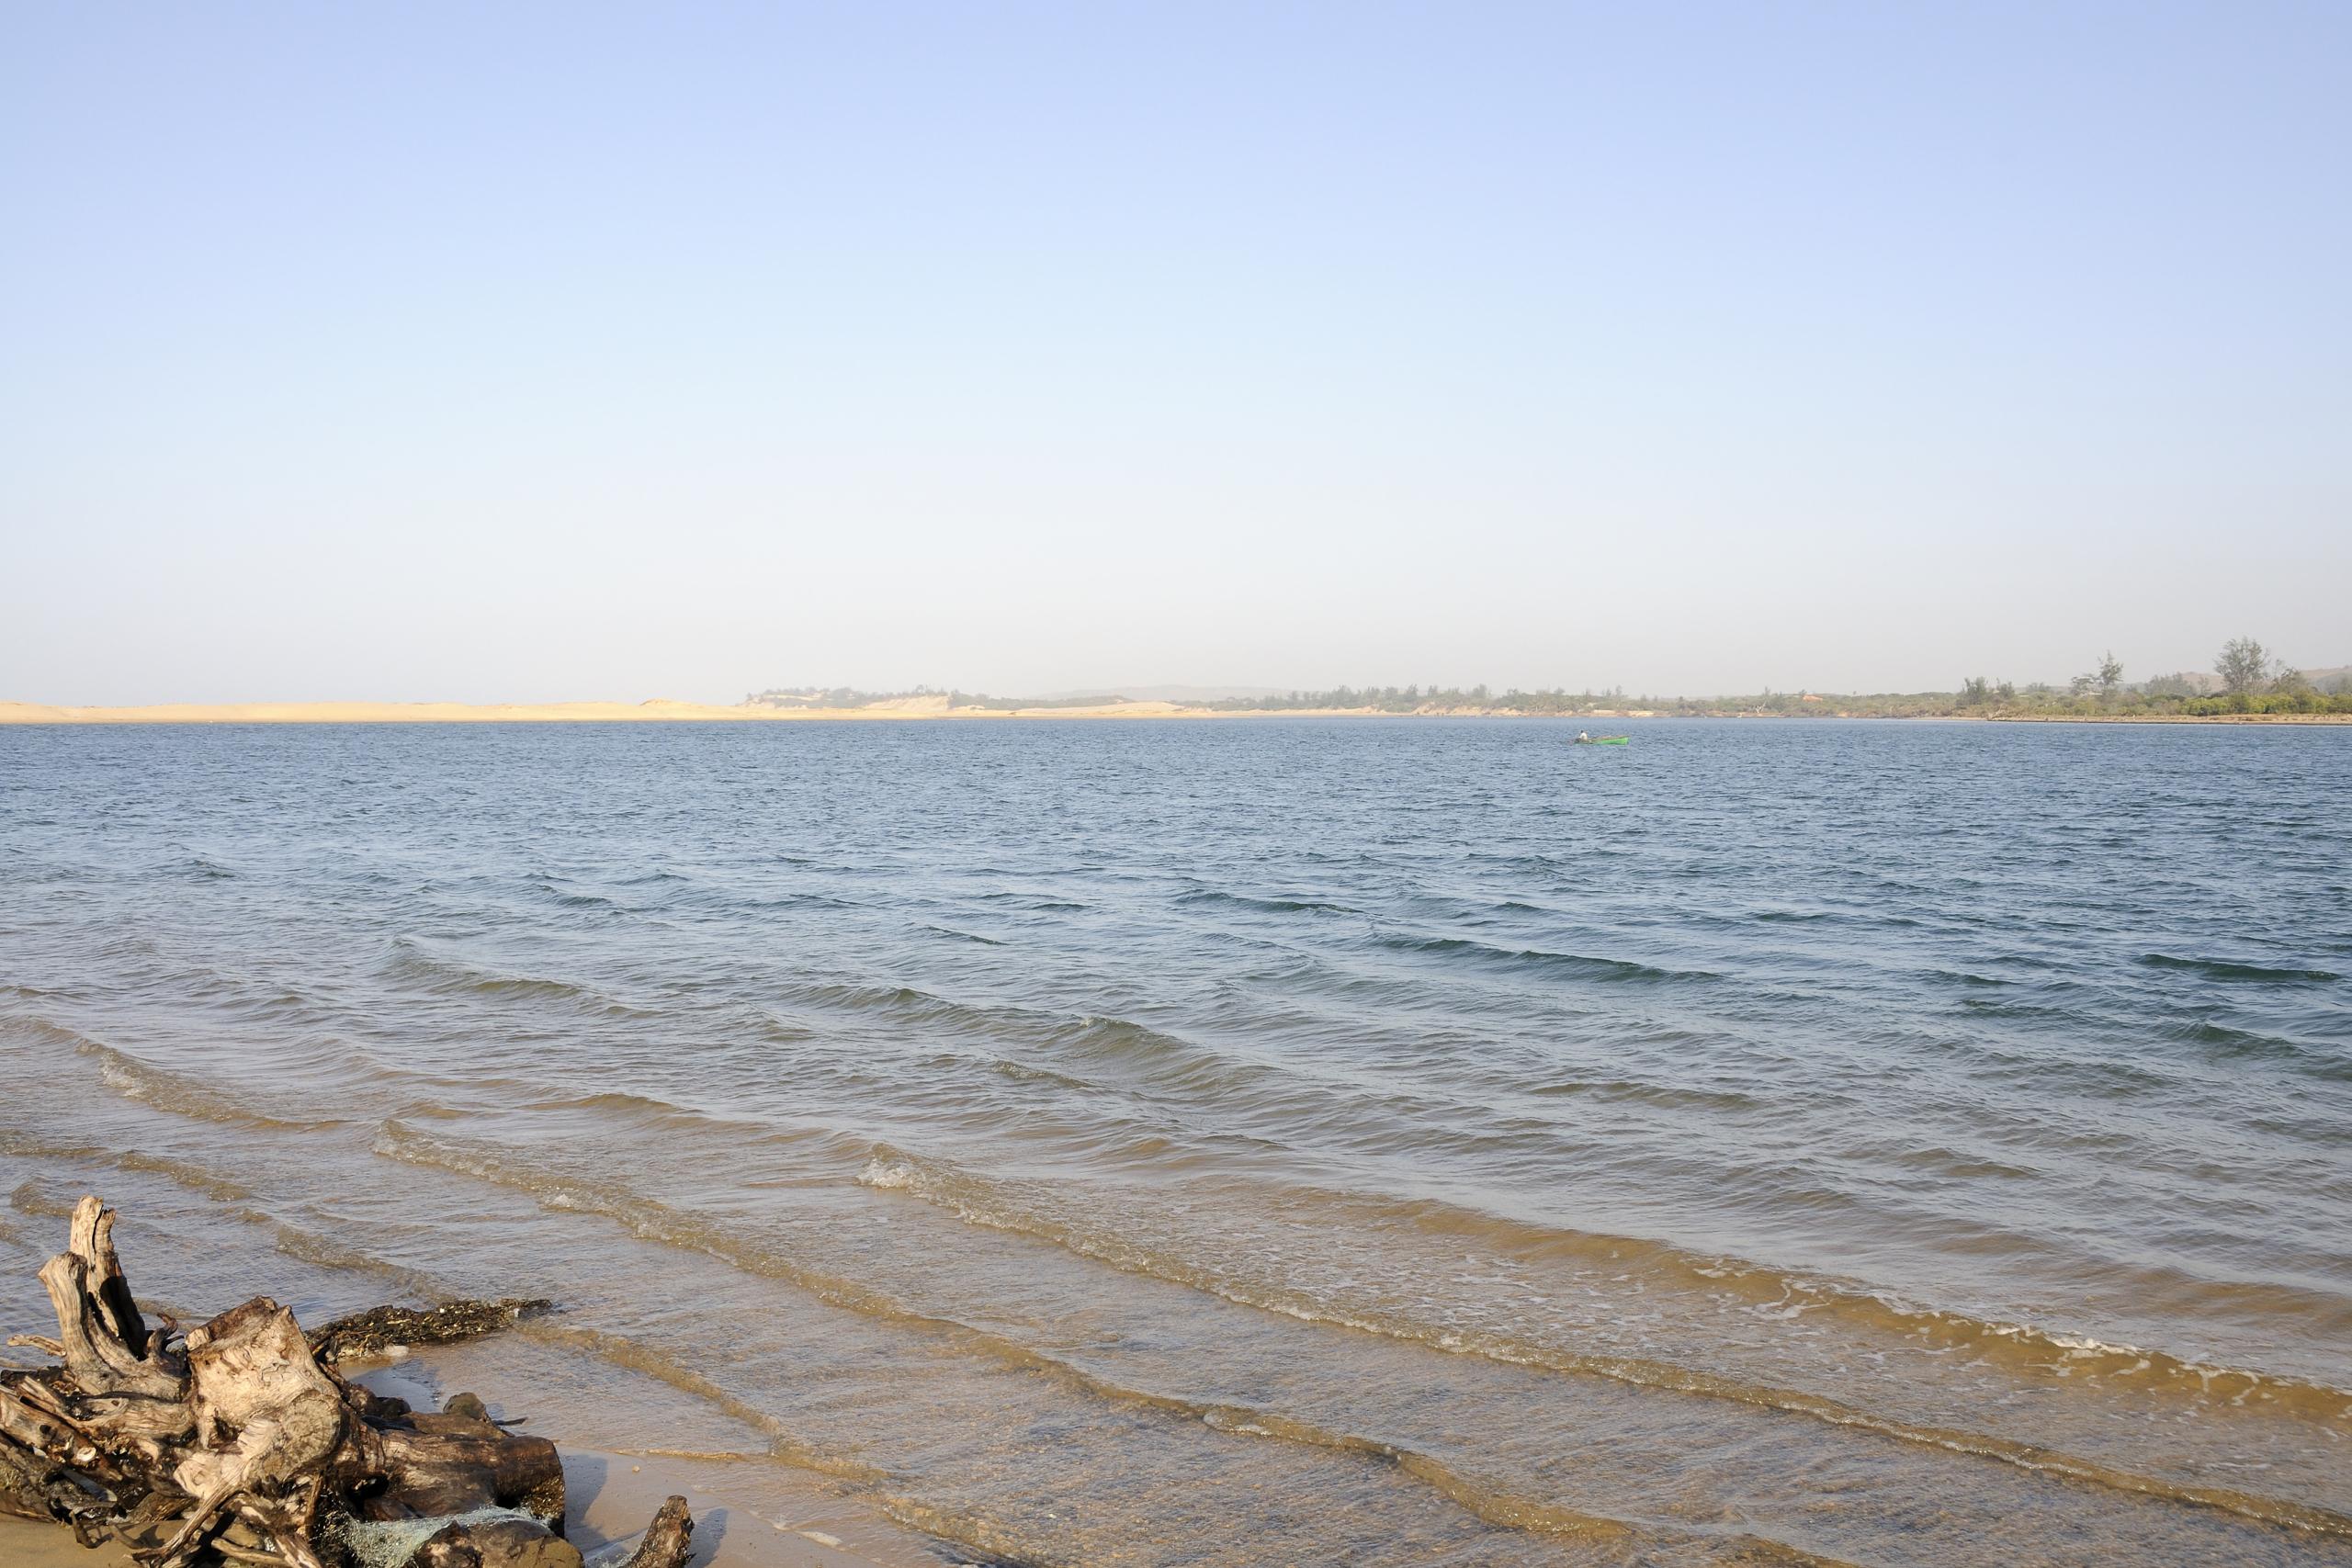 EU/UNICEF Seawater Desalination Efforts in Gaza